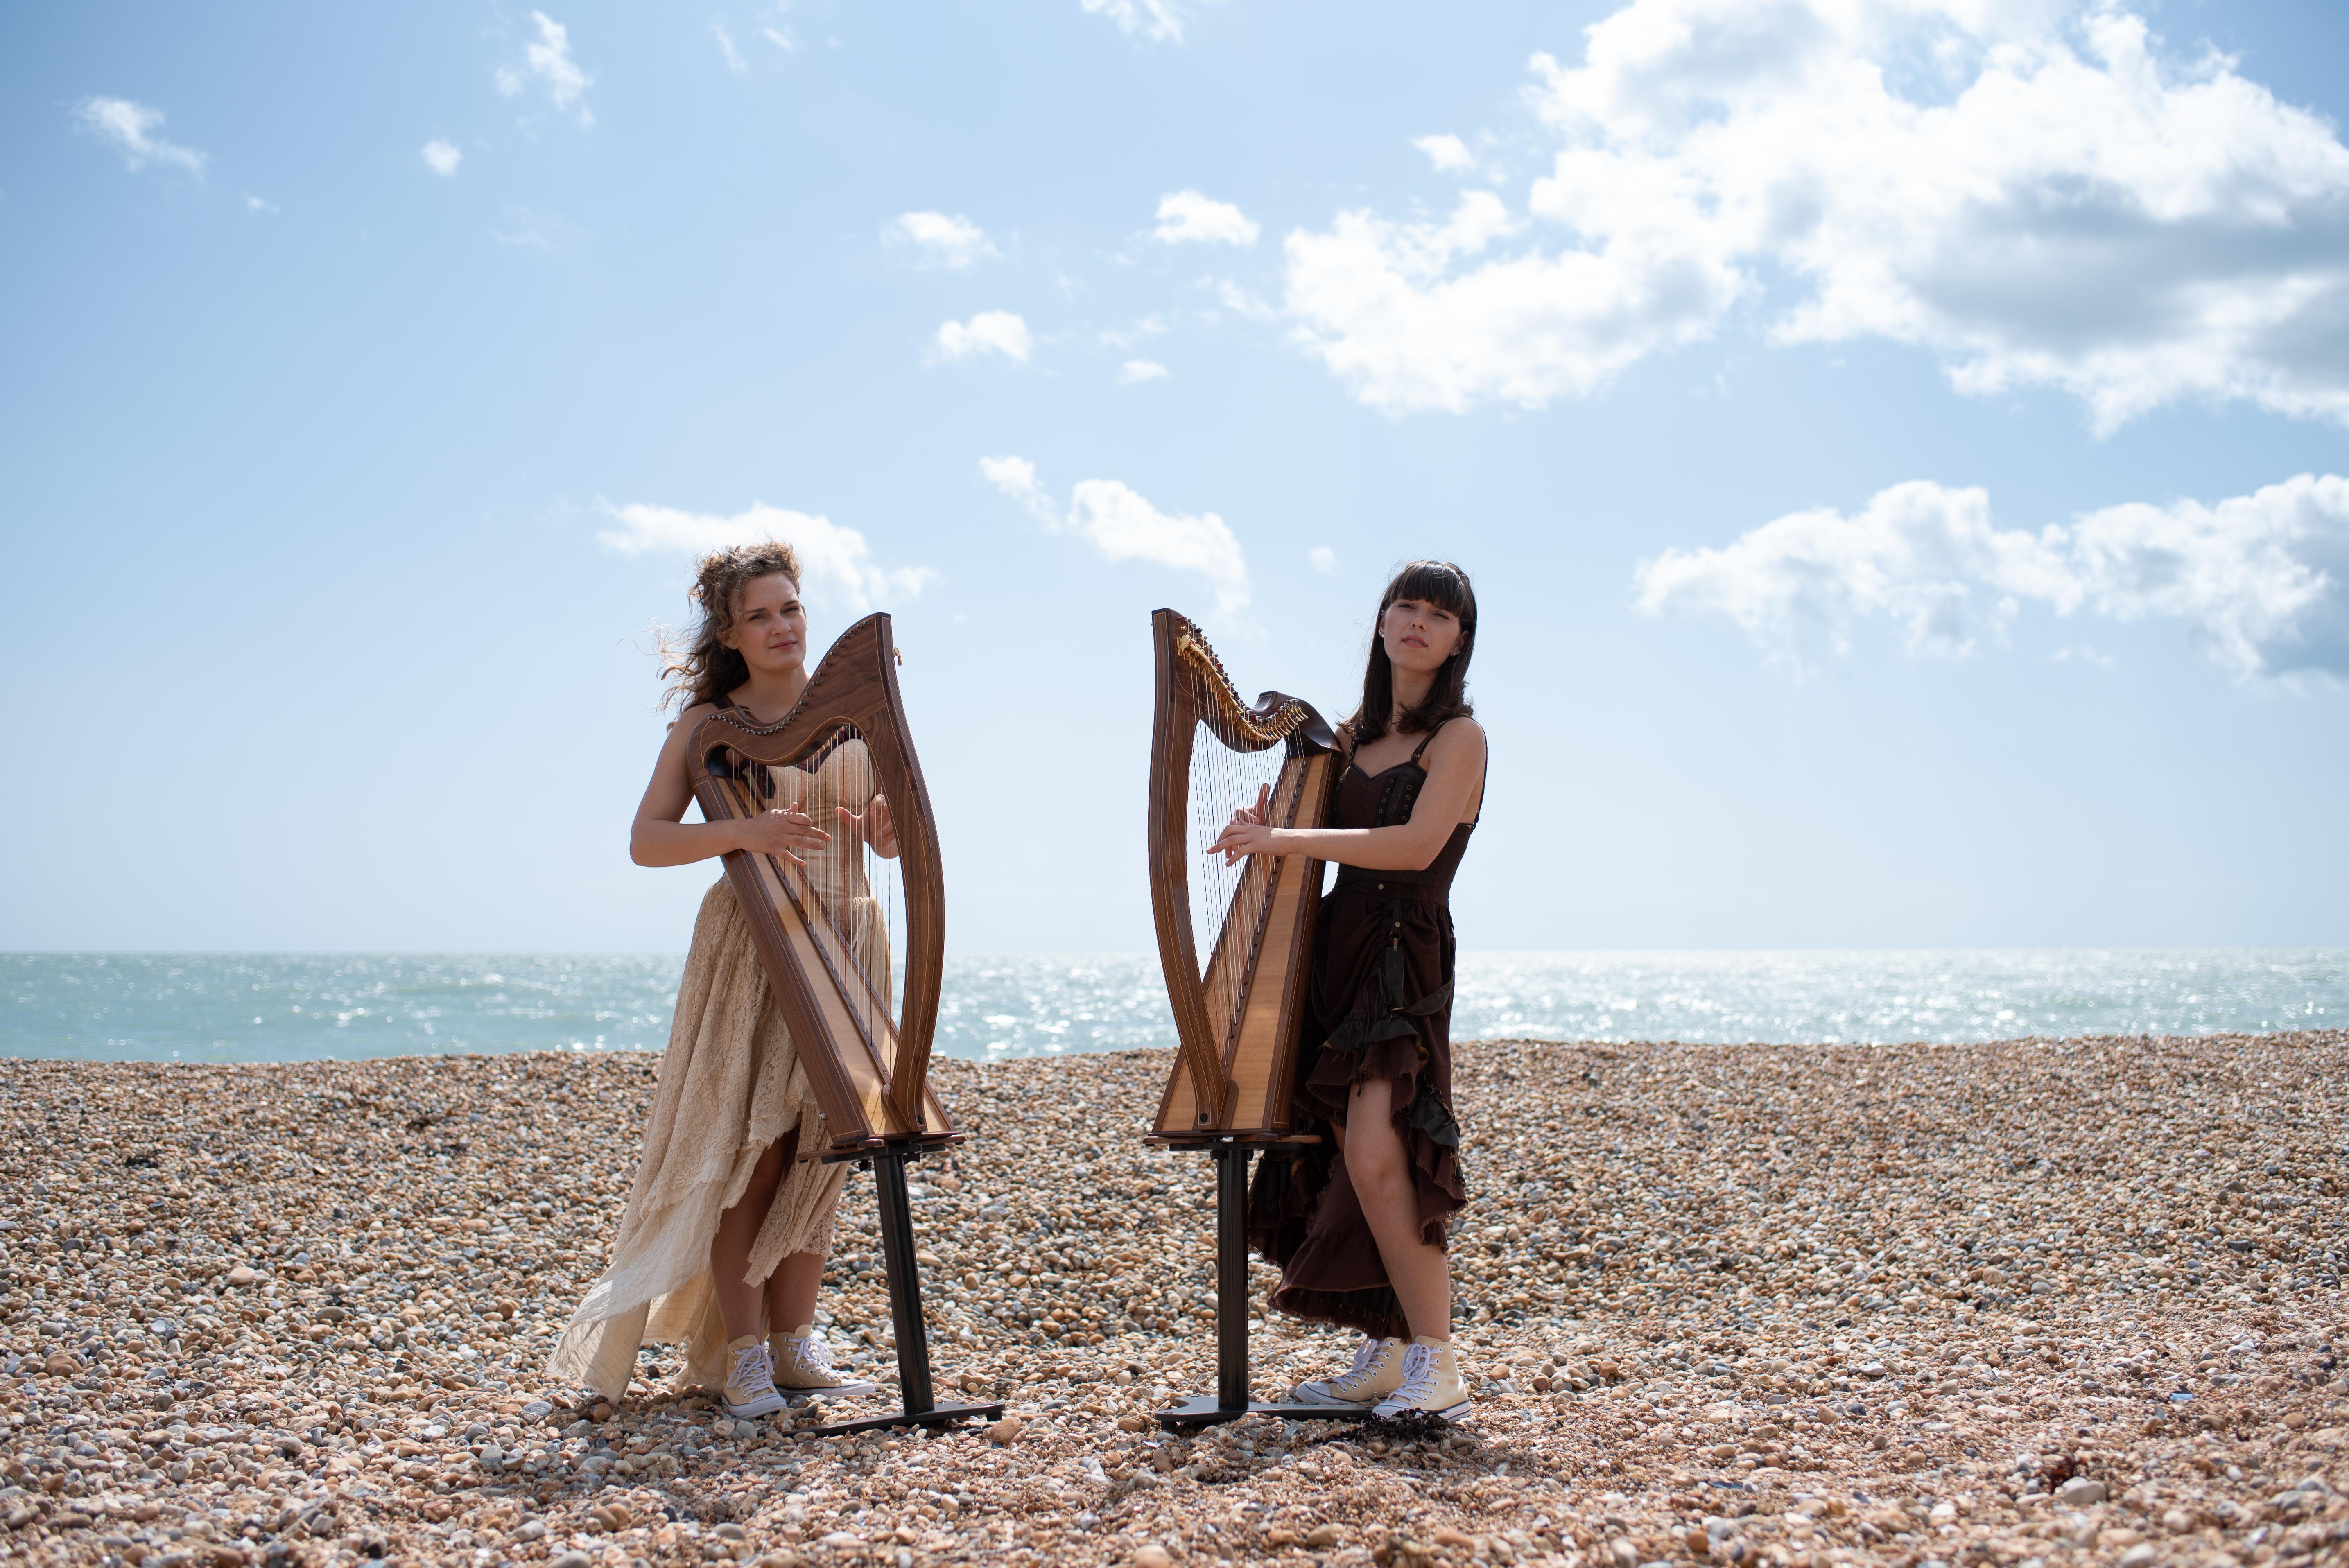 Harp playing sisters harpists Adel and Karina on Sandgate beach